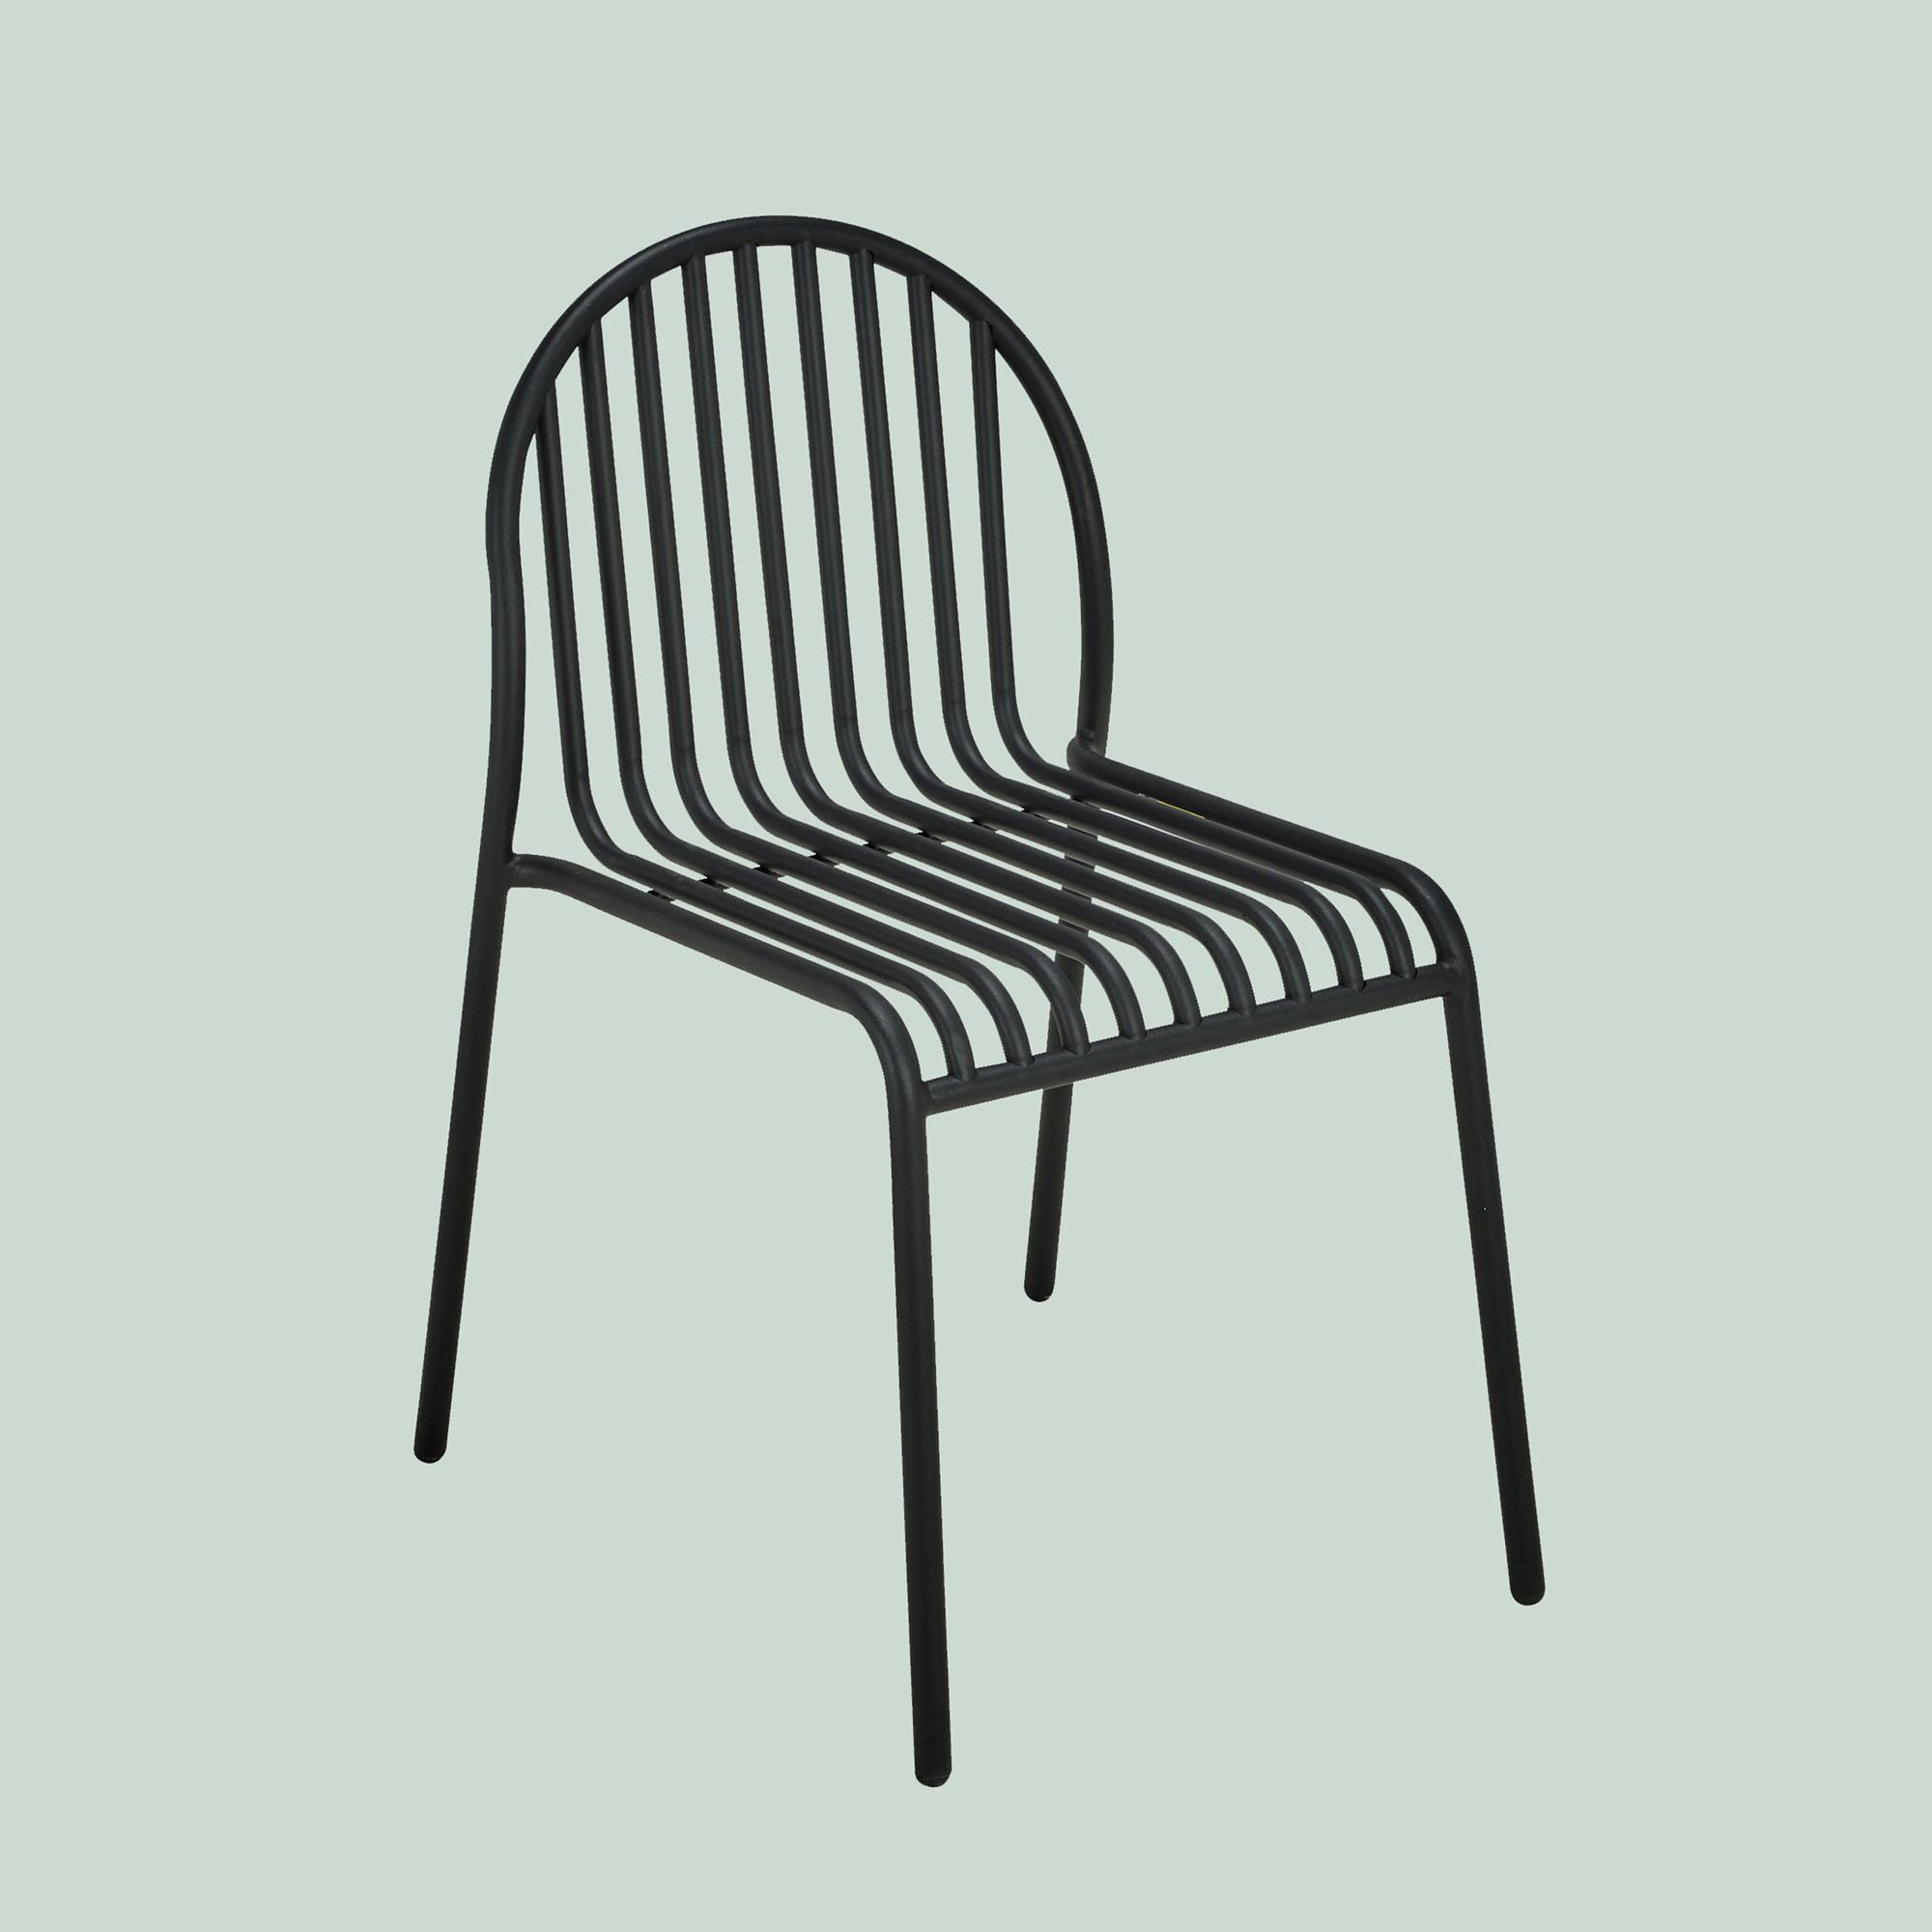 Salon De Jardin Design Sifas Basket | Segue Collection Paul Brayton ...